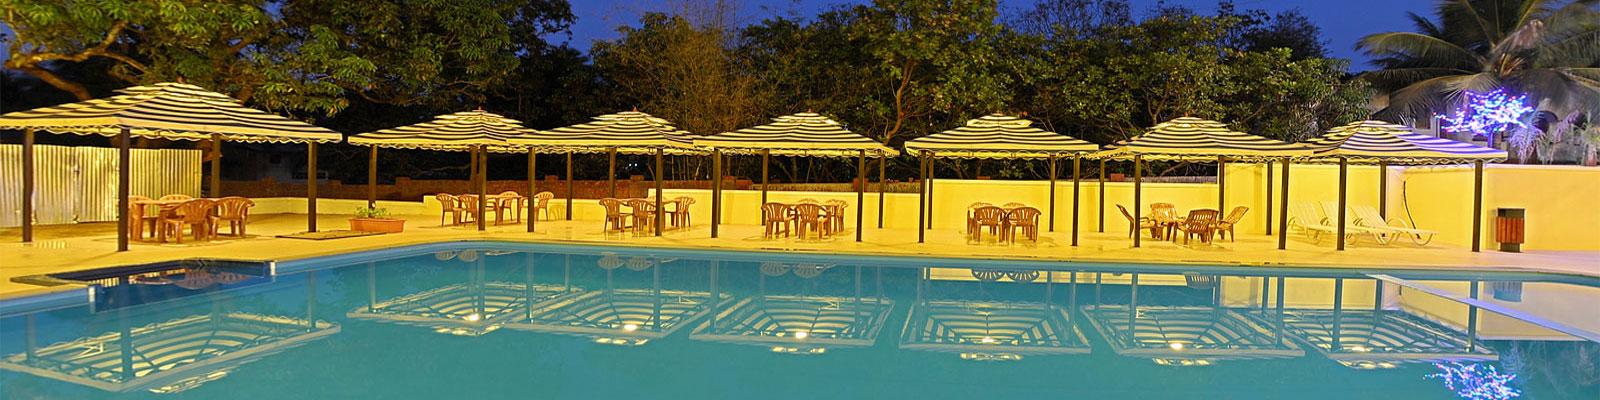 Hotel In Goa With Swimming Pool Grand Goa Exotica